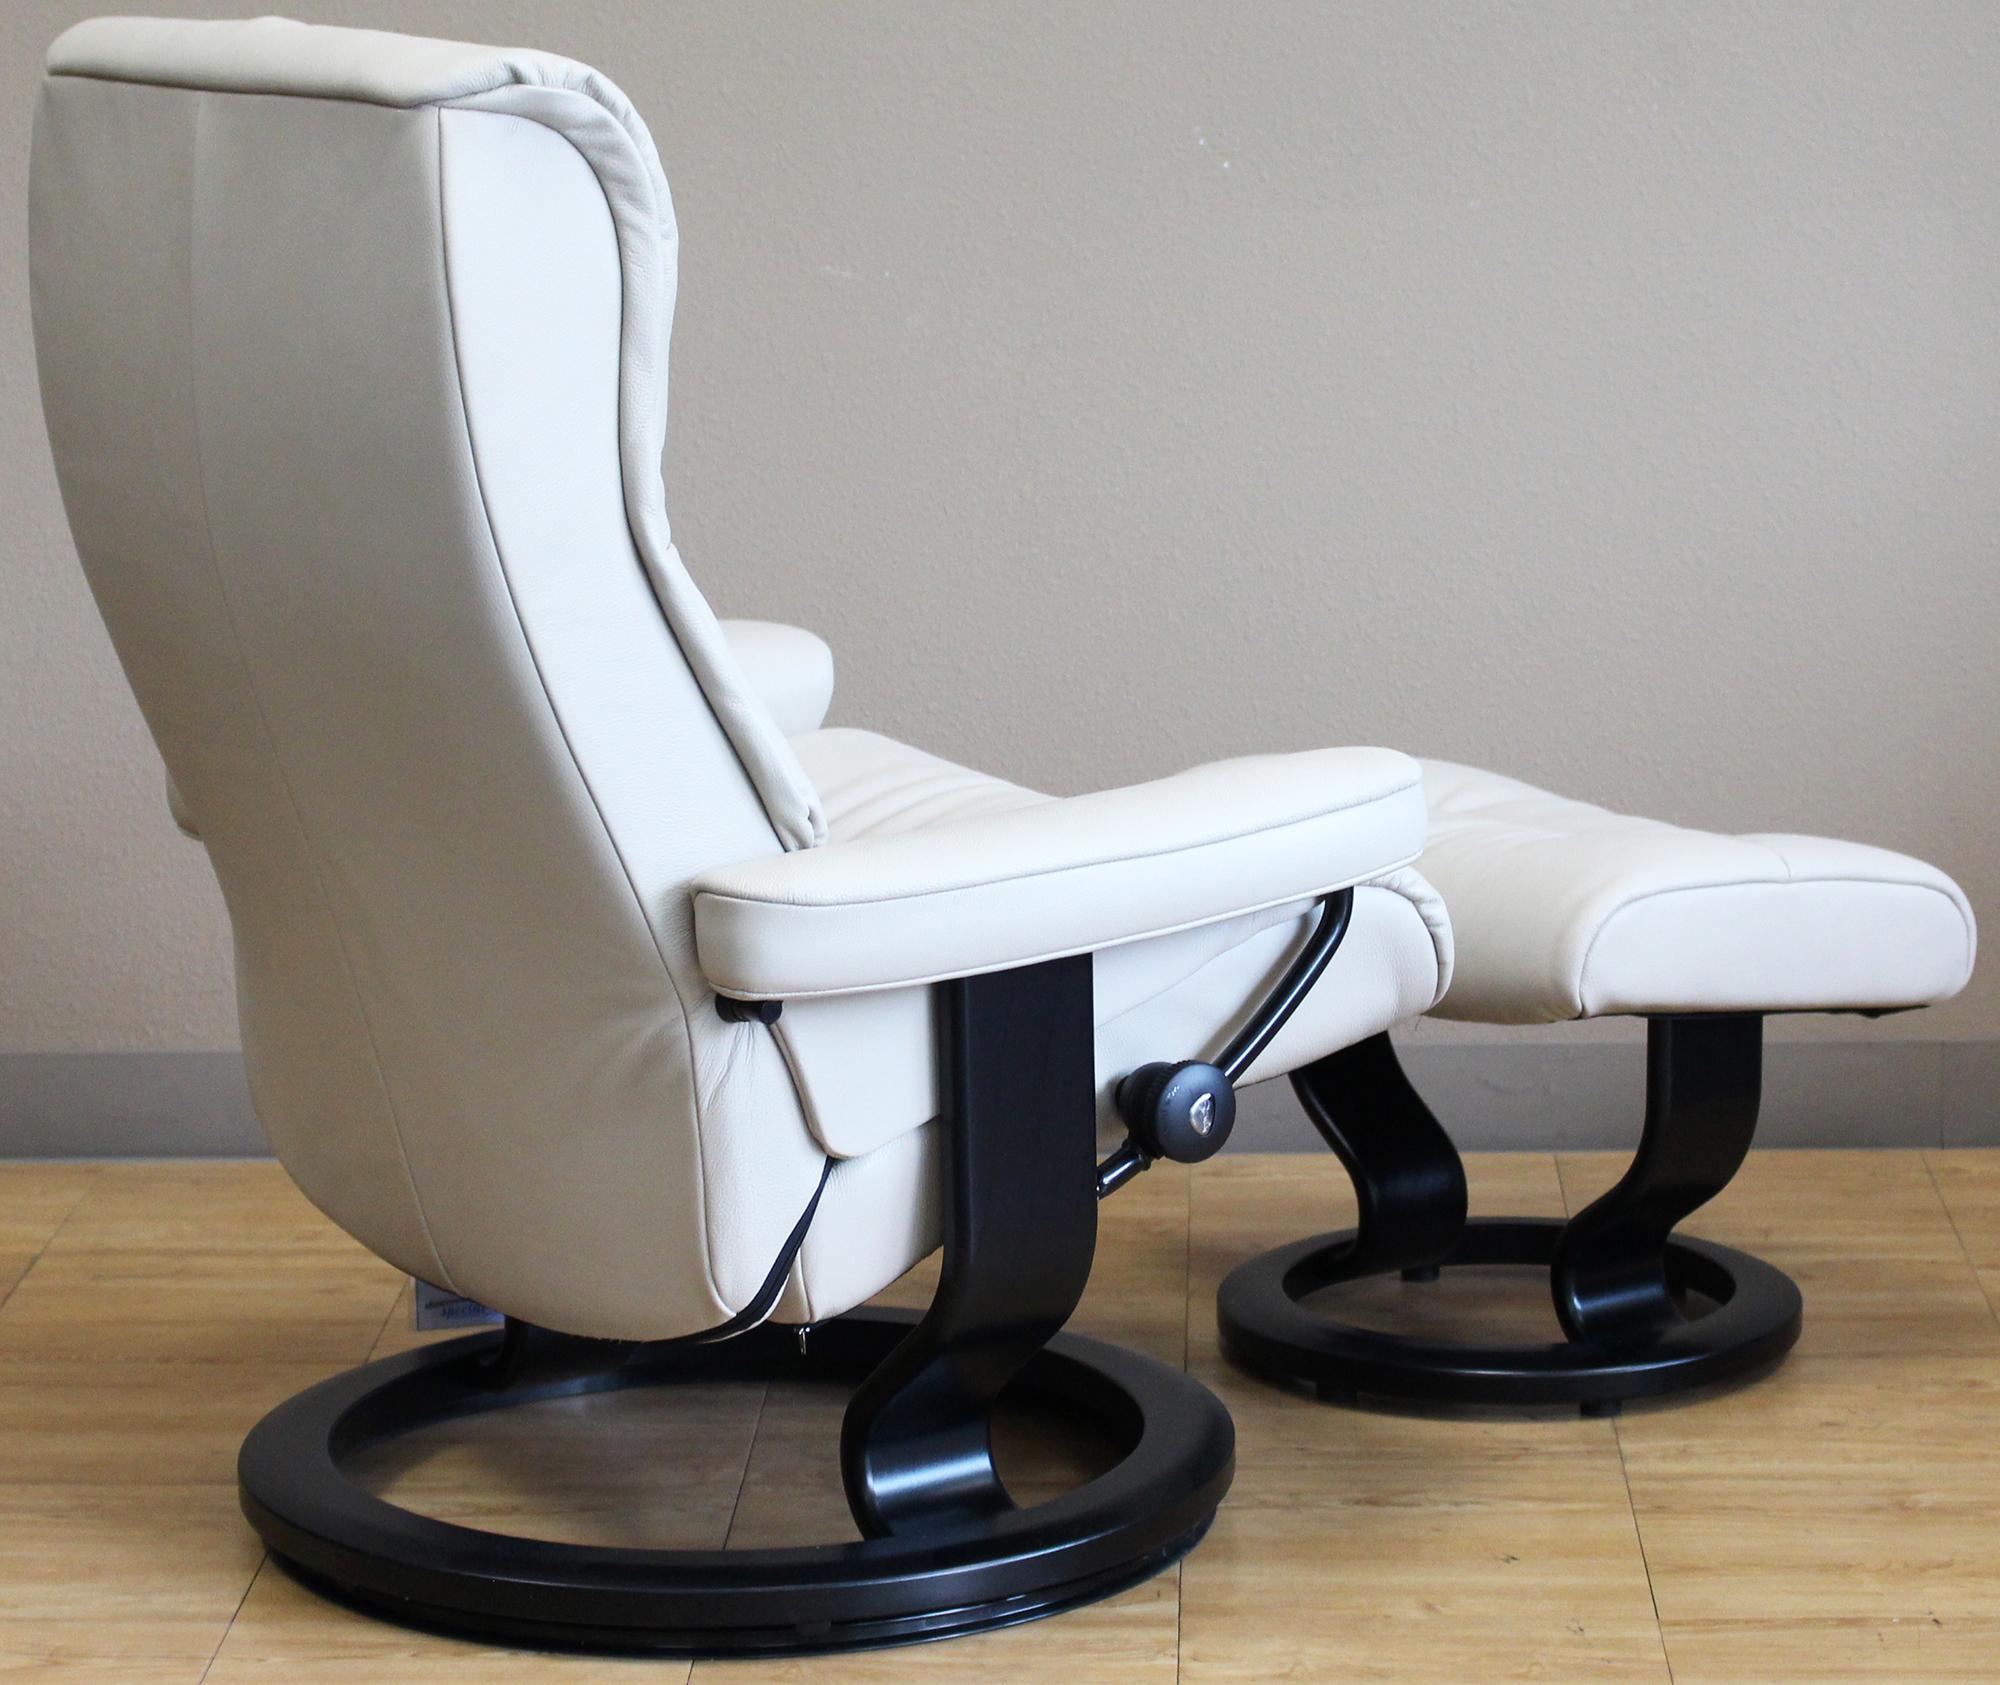 ekornes chair accessories foldable floor india stressless crown cori vanilla white leather recliner